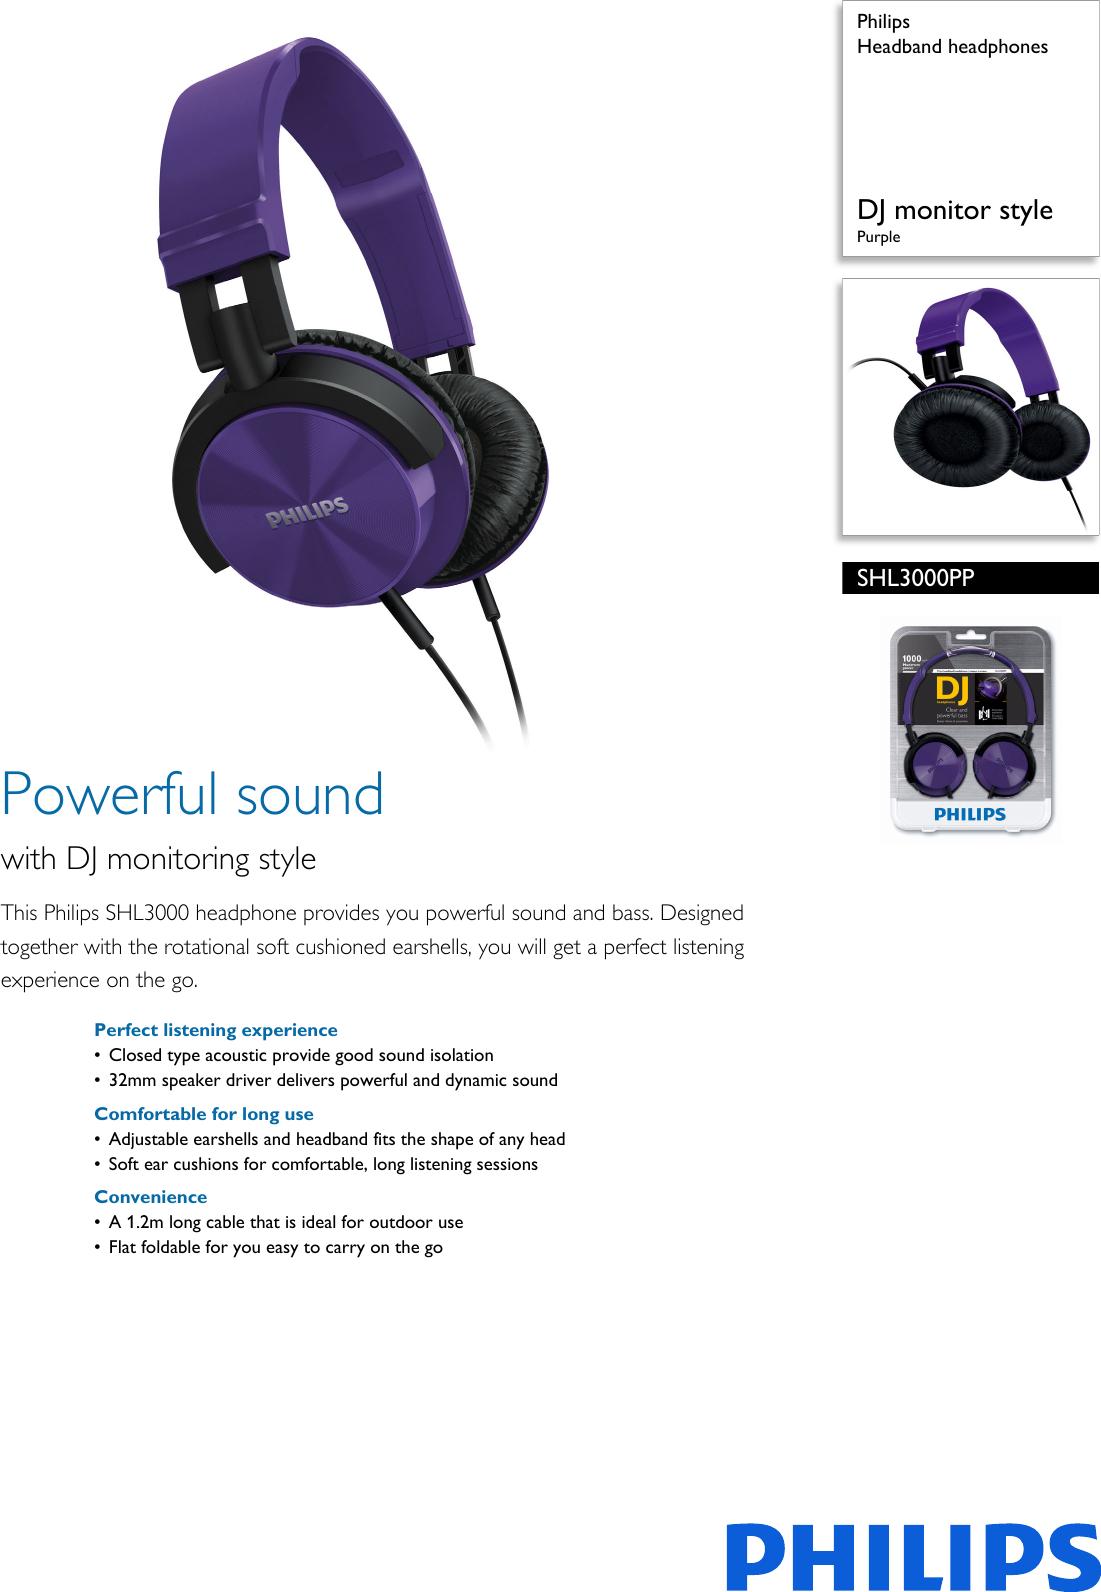 14ccd7633ff Philips SHL3000PP/00 Headband Headphones User Manual Leaflet Shl3000pp 00  Pss Aenus